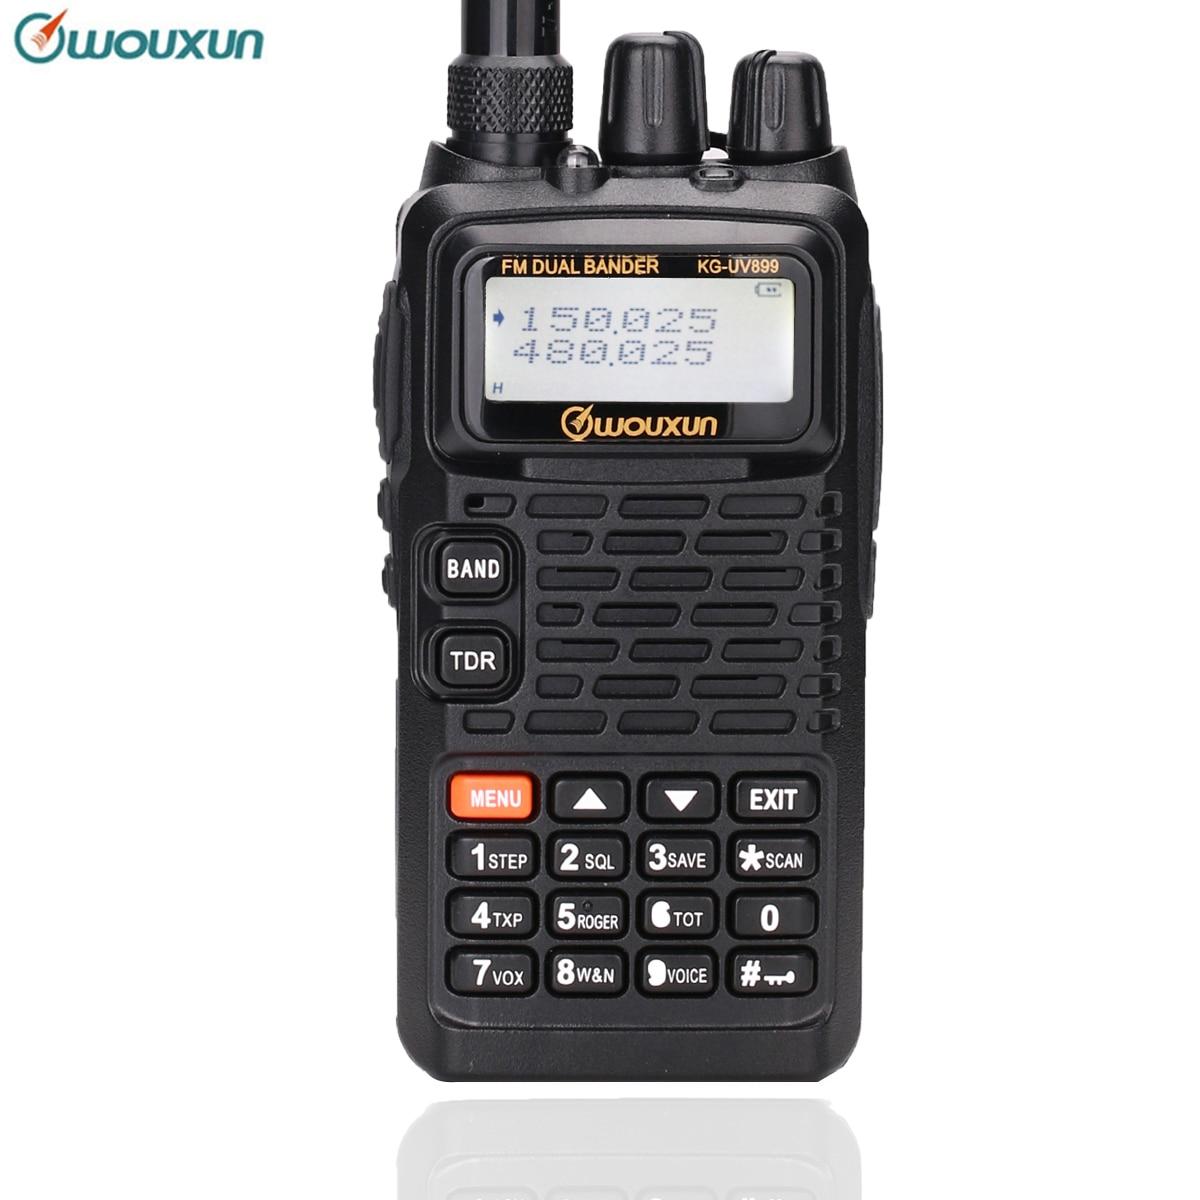 Original WOUXUN KG UV899 Dual Band Two Way Radio with 1700mAh battery FM Transceiver Walkie Talkie UHF VHF HAM Radio